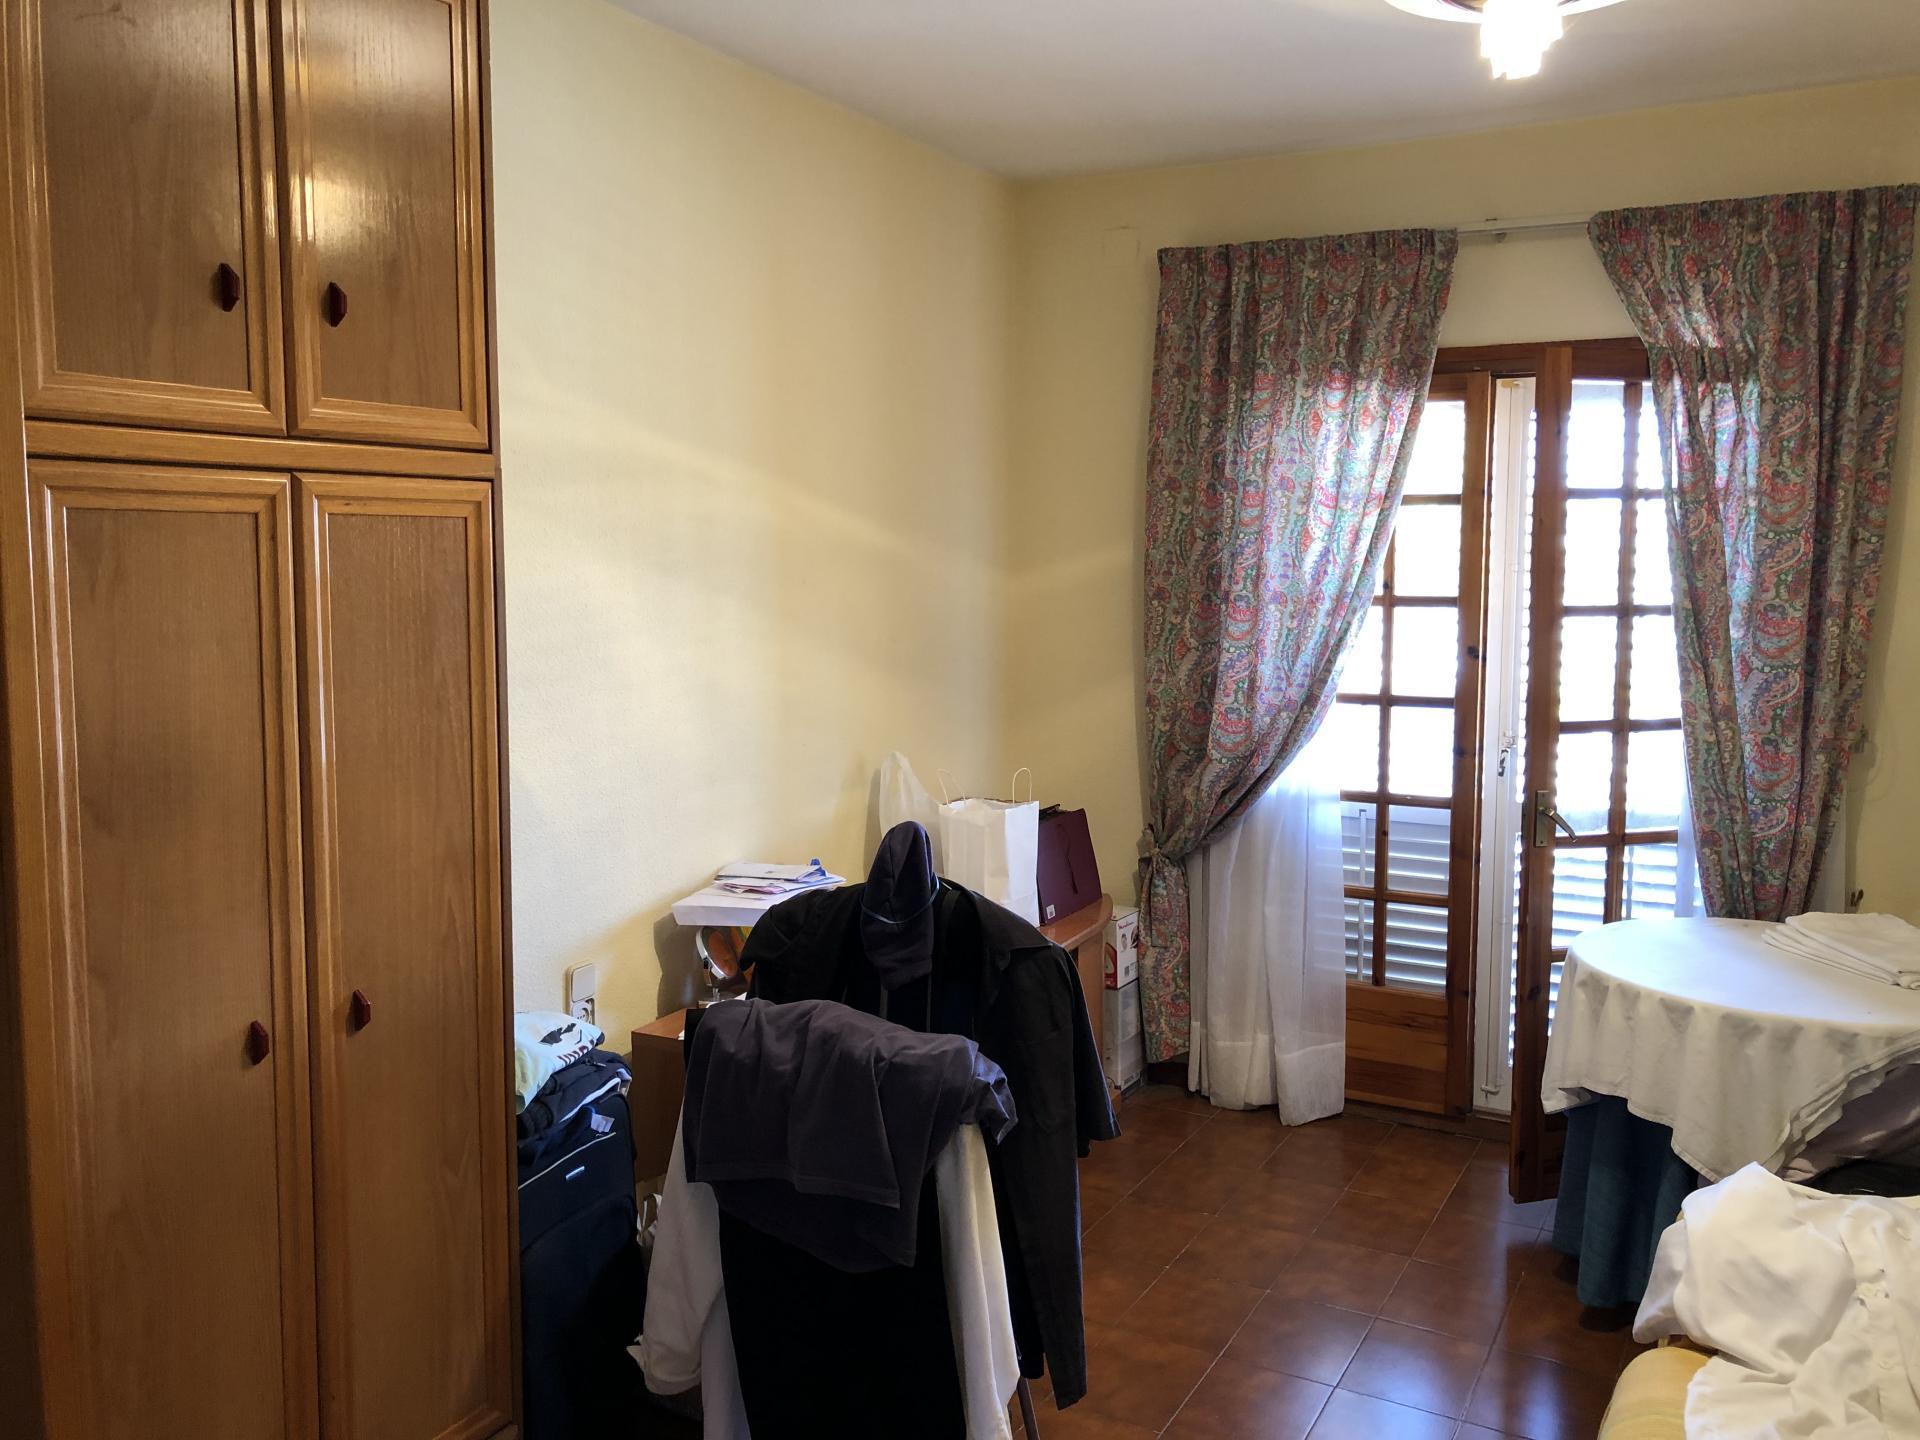 Foto 42 (V-735-2021) - Inmueble en  Venda a Santa Margarida i els Monjos